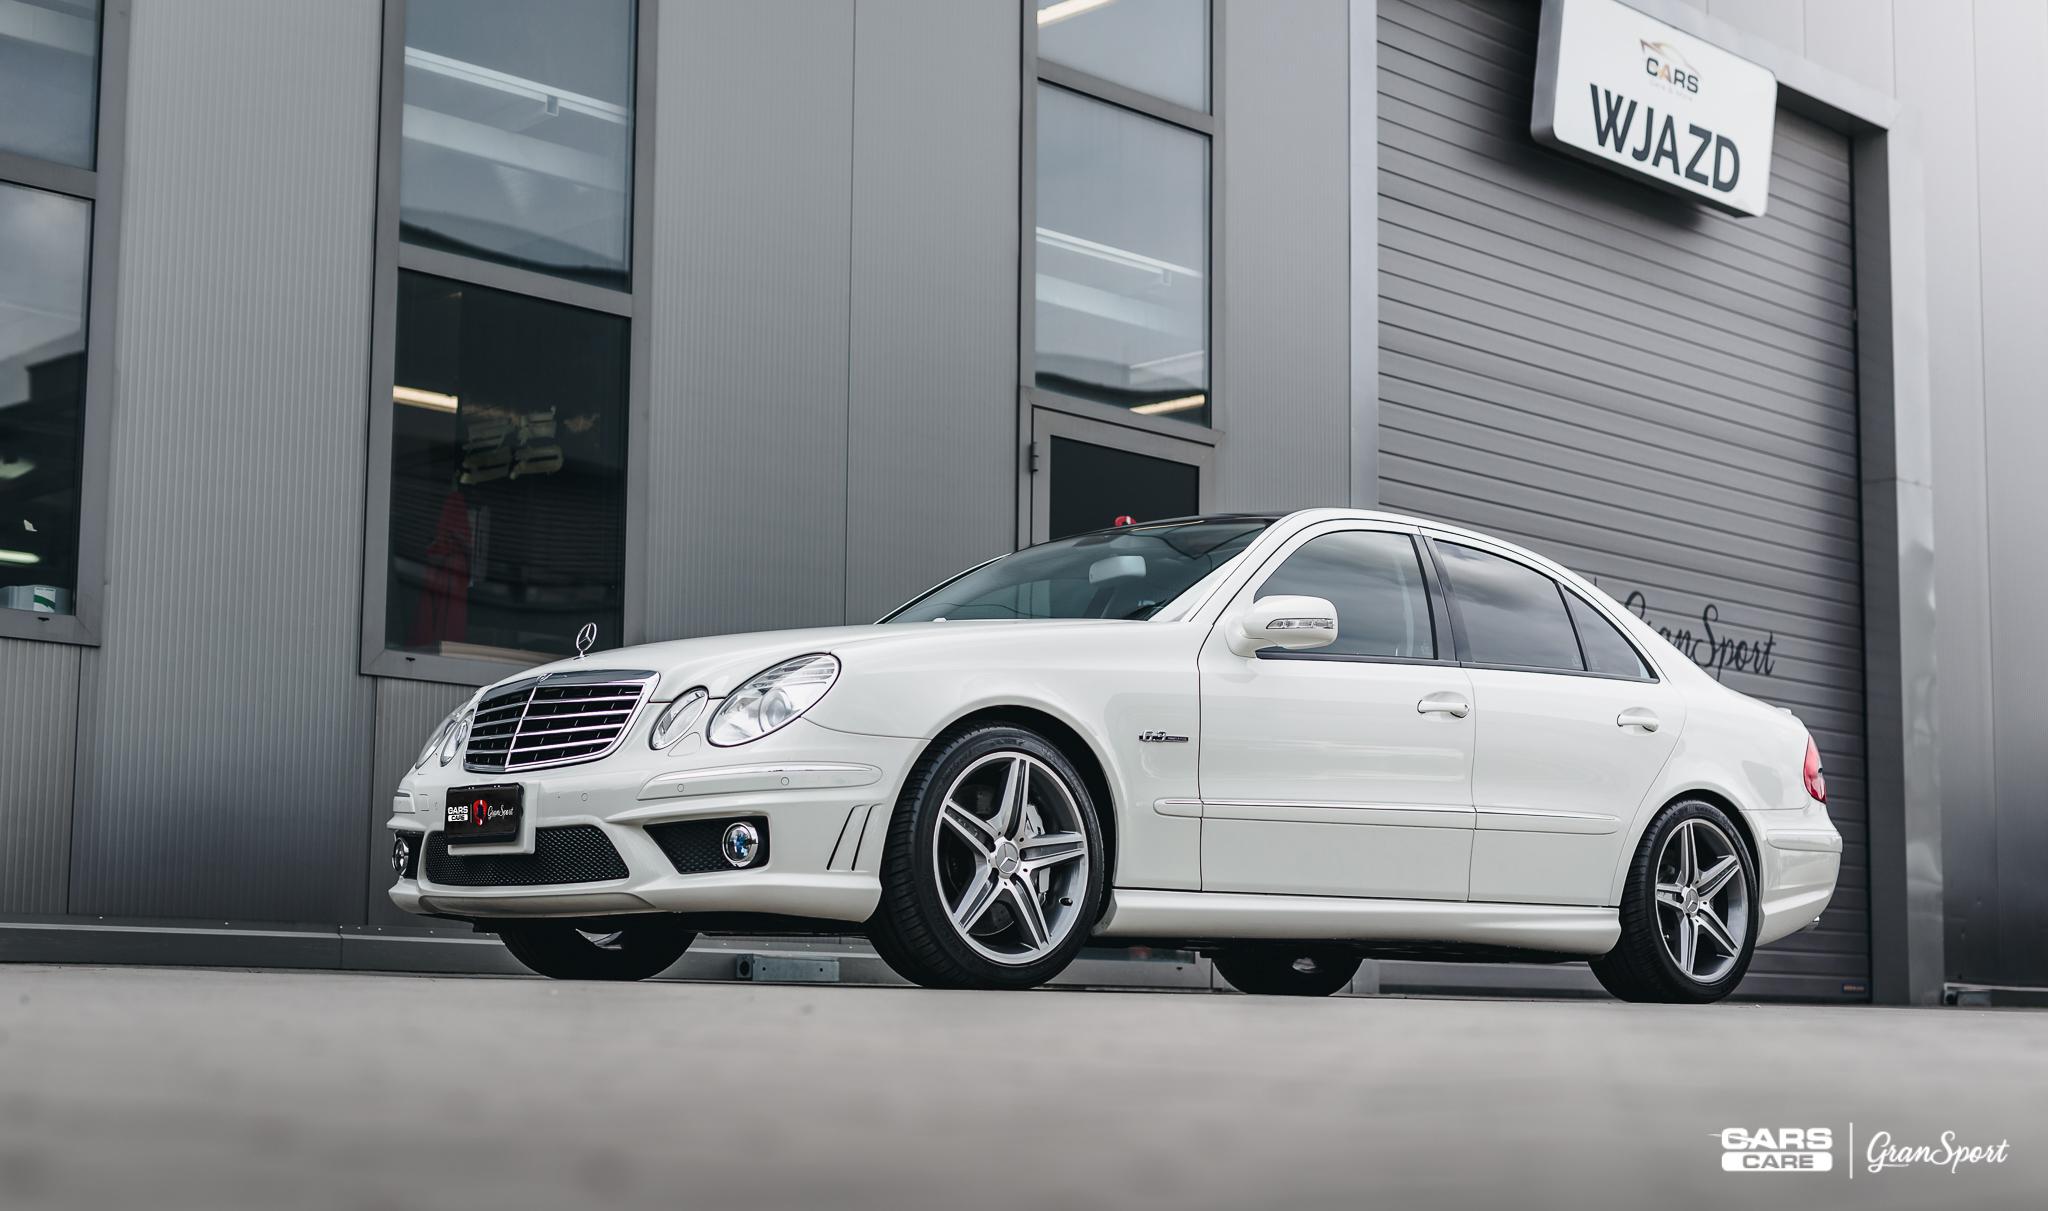 Mercedes-Benz E 63 AMG - auto detailing - carscare.pl